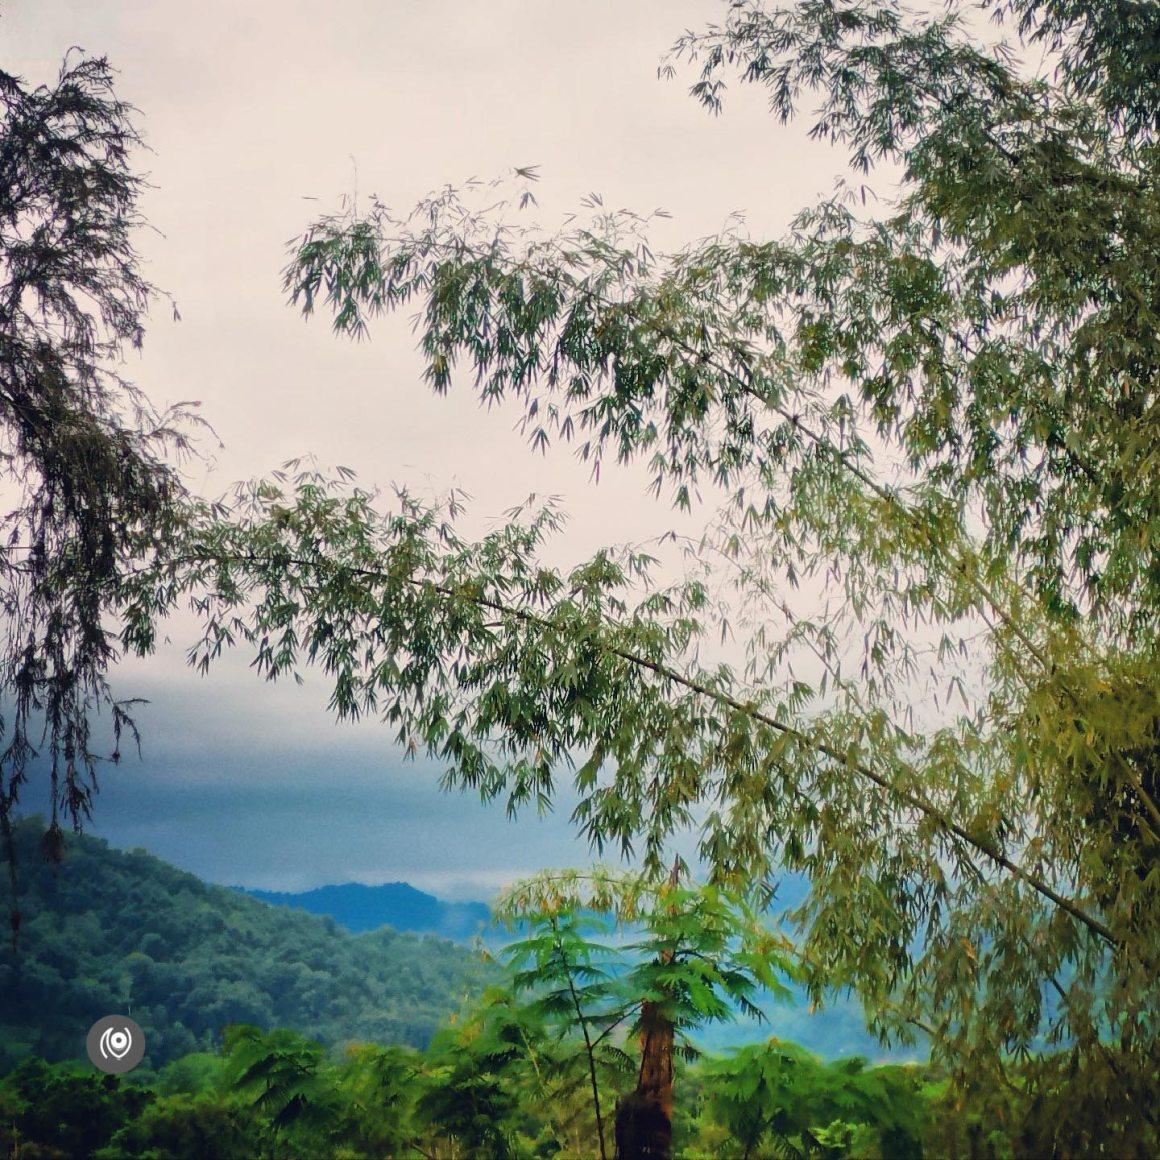 Aalong, Aalon, Alo, Aalo, Kaying to Aalong, Arunachal Pradesh, Travel Photographer, Travel Blogger, Luxury Photographer, Luxury Blogger, EyesForDestinations, EyesForArunachal, #EyesForDestinations, #EyesForArunachal, Patum Bridge